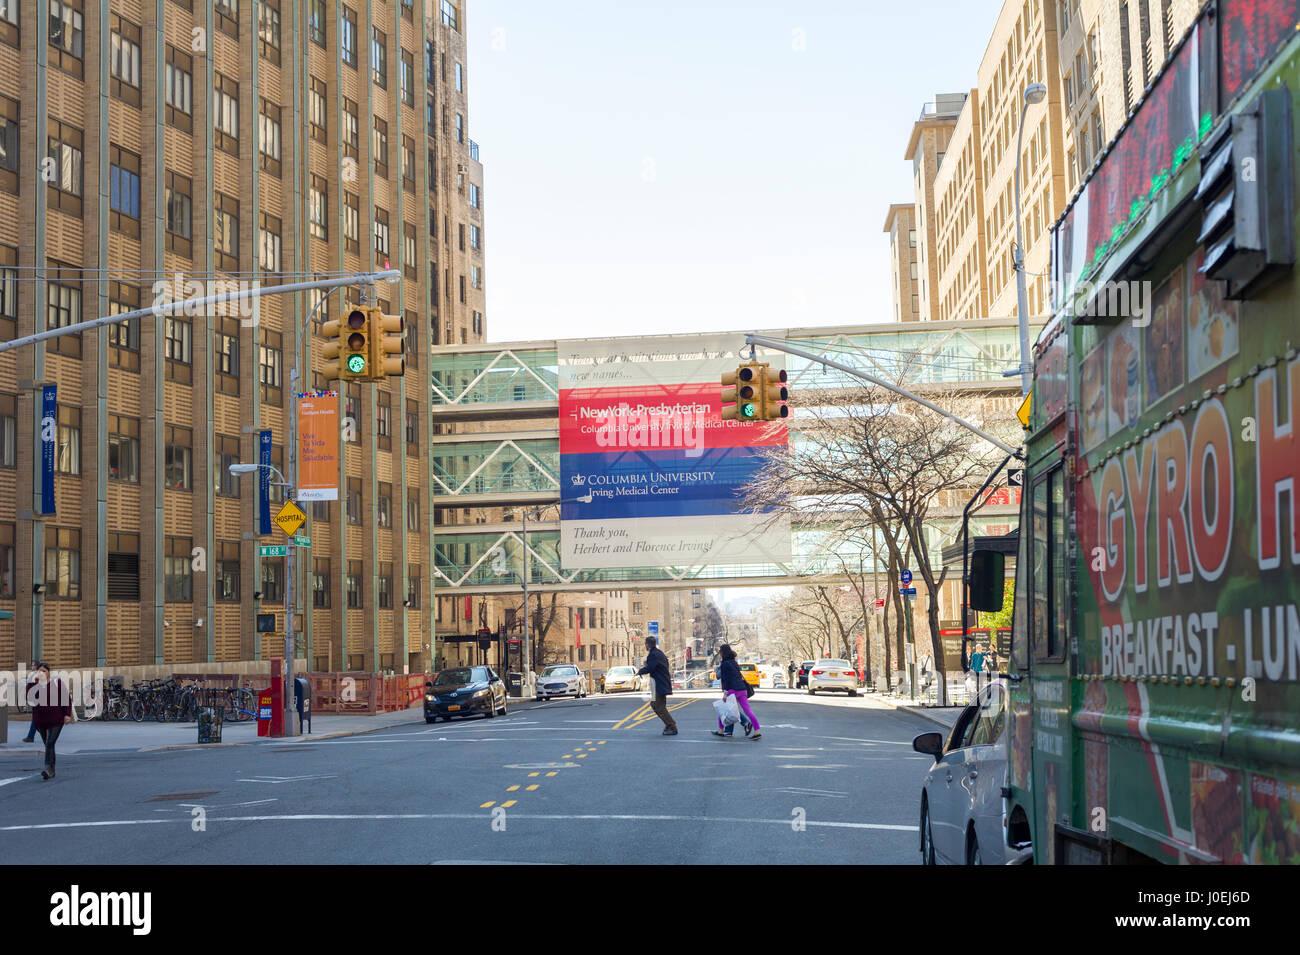 New York Presbyterian Hospital Stock Photos & New York